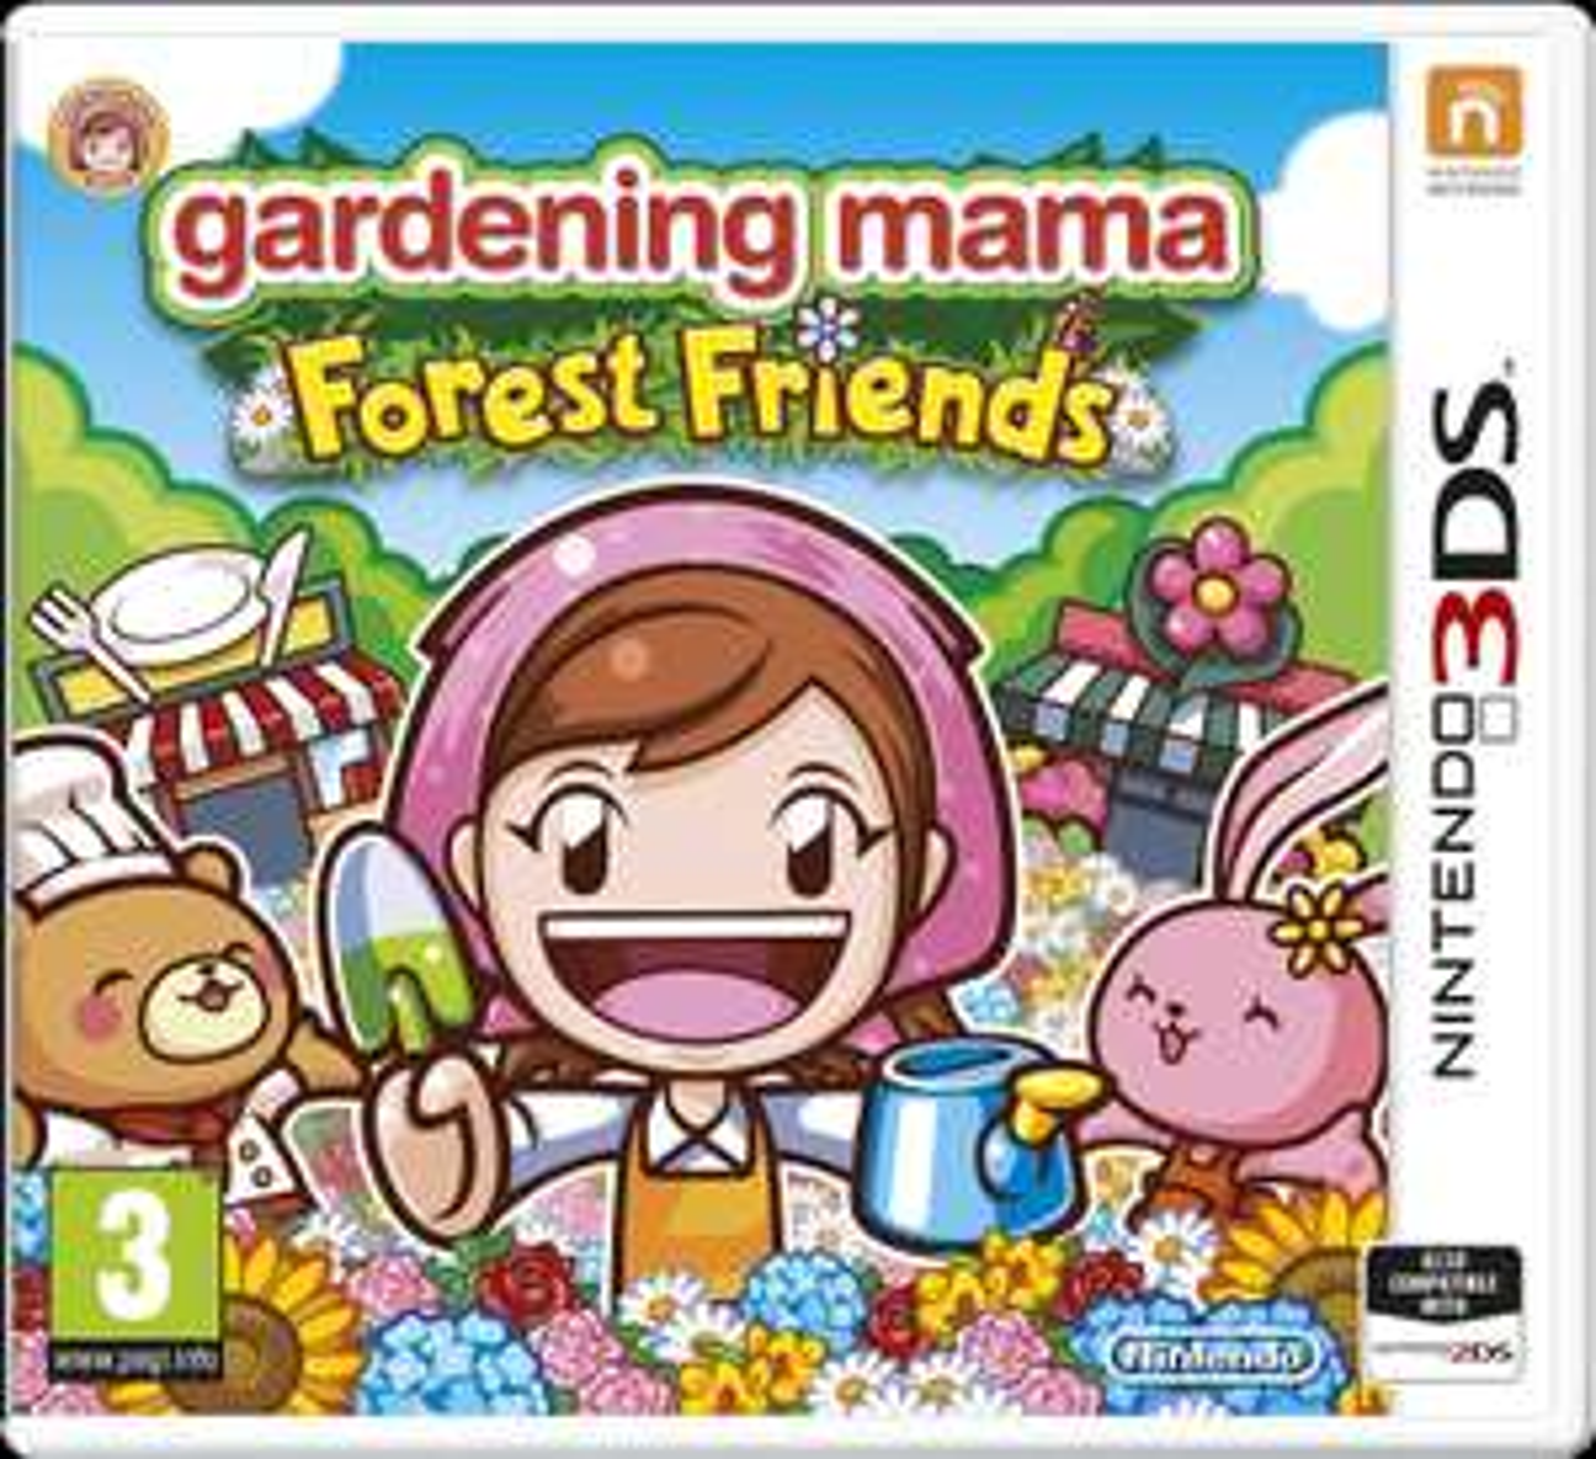 Gardening Mama: Forest Friends Nintendo 3DS Game - From Argos on ebay £7.99